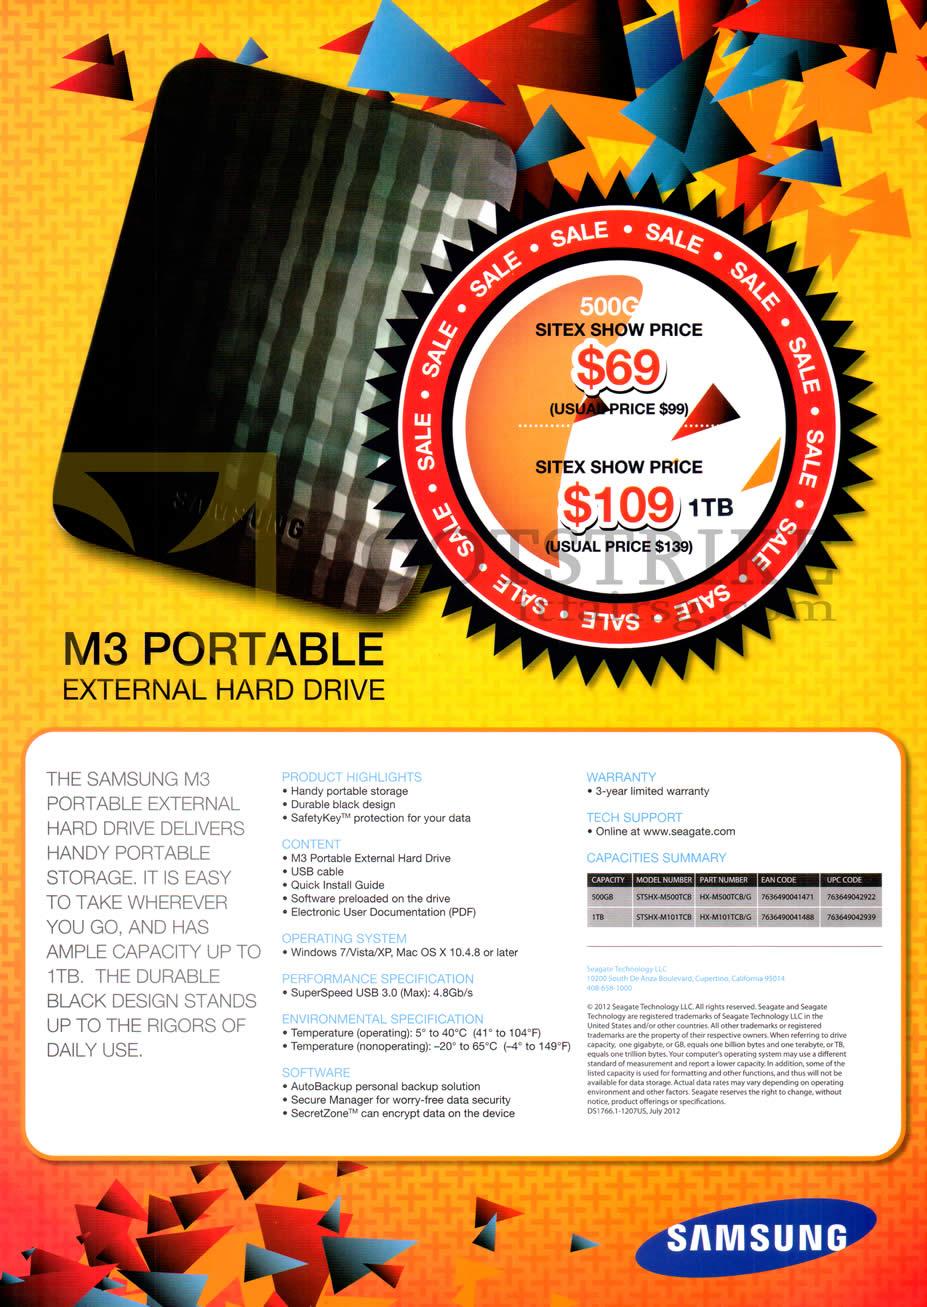 SITEX 2012 price list image brochure of Samsung External Storage M3 Portable